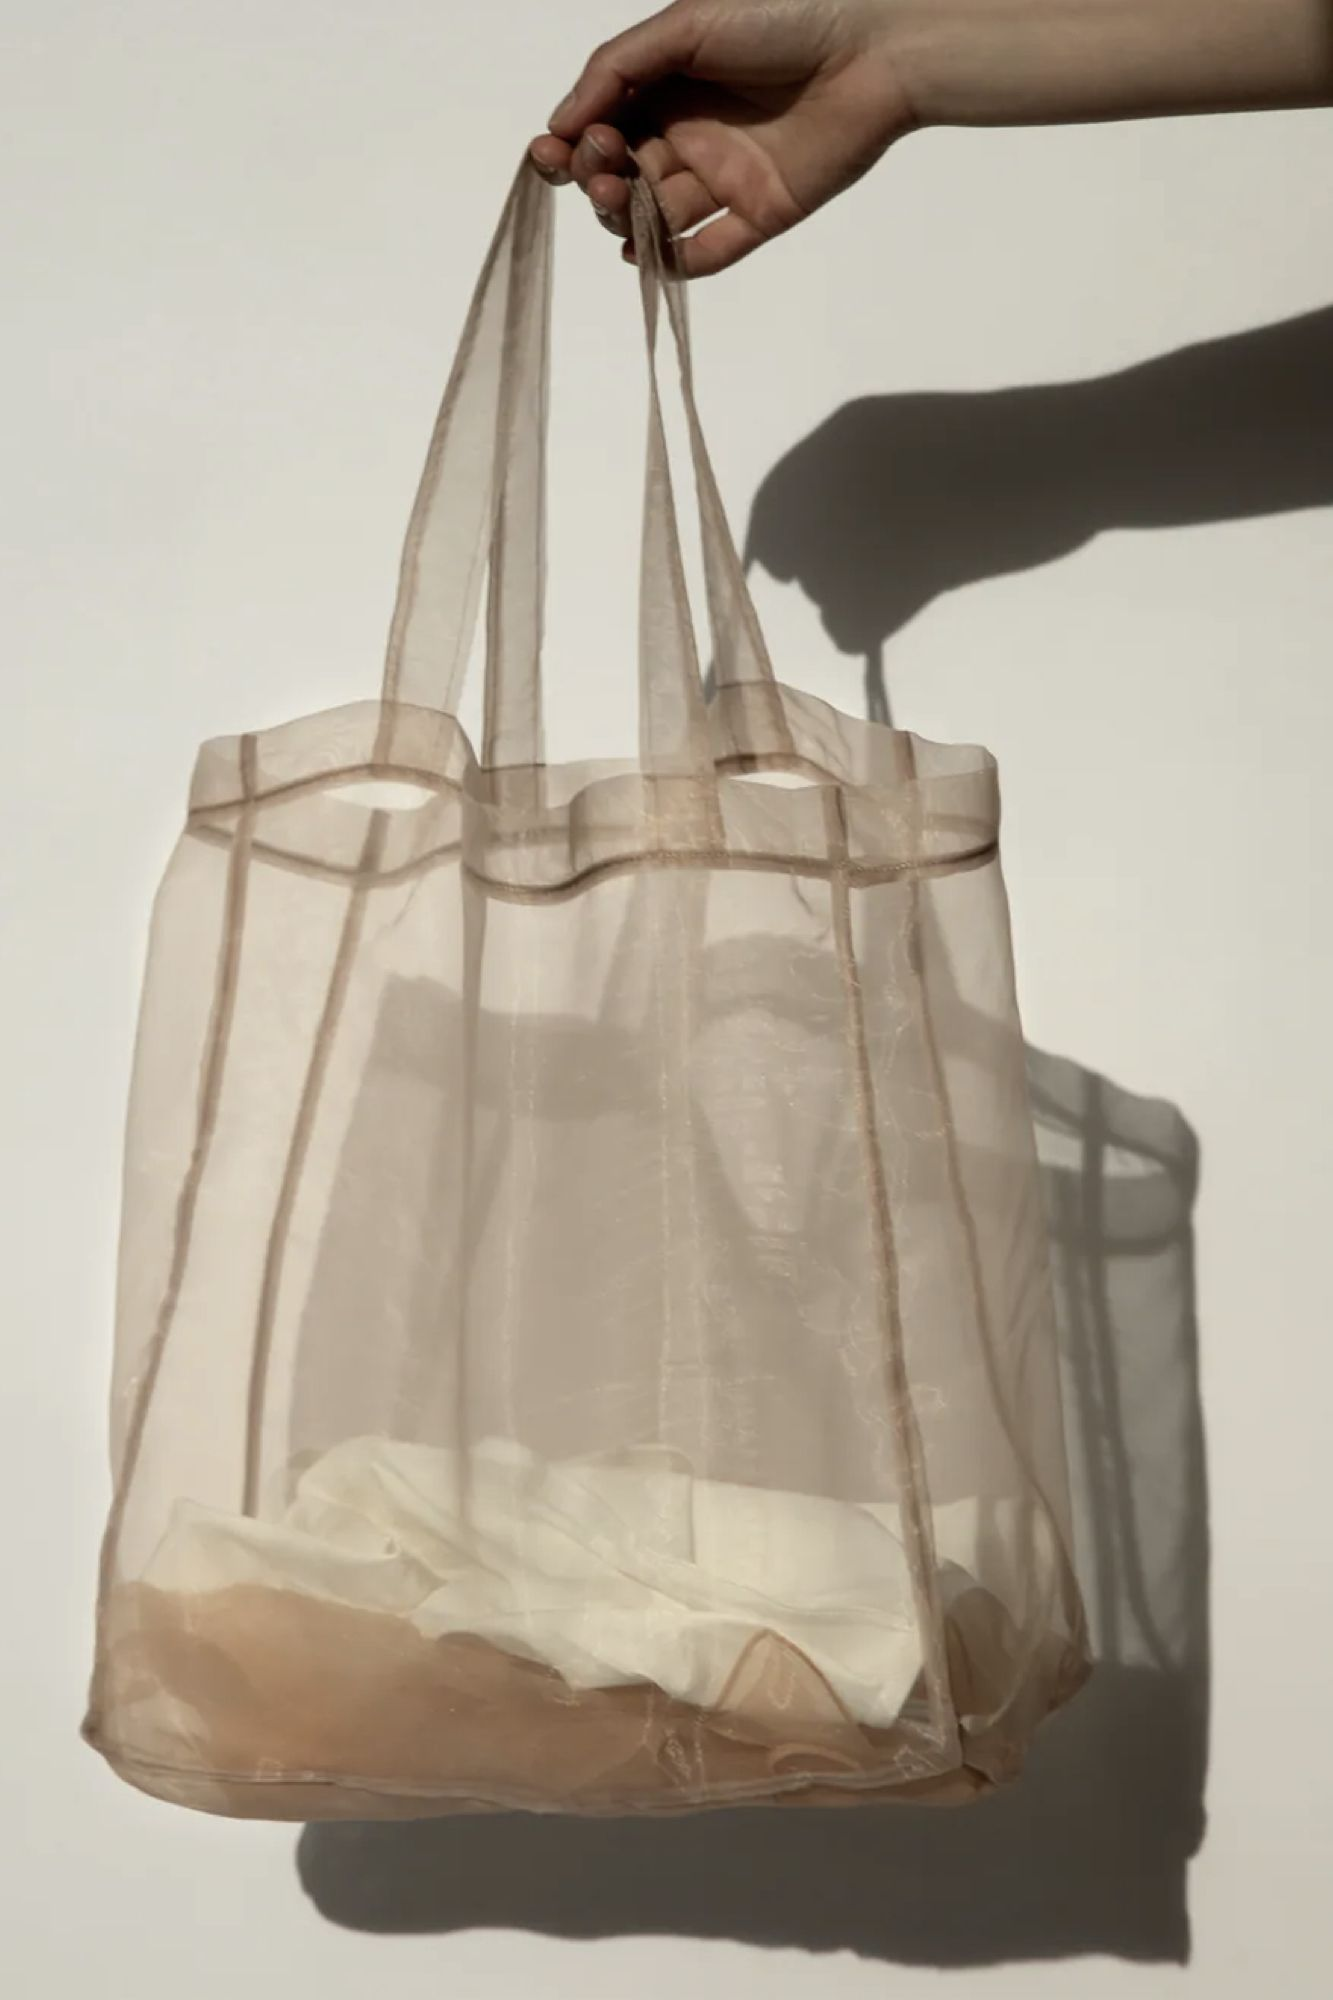 detalle bolsa de organza con conjunto de lencería premium edición limitada de zara